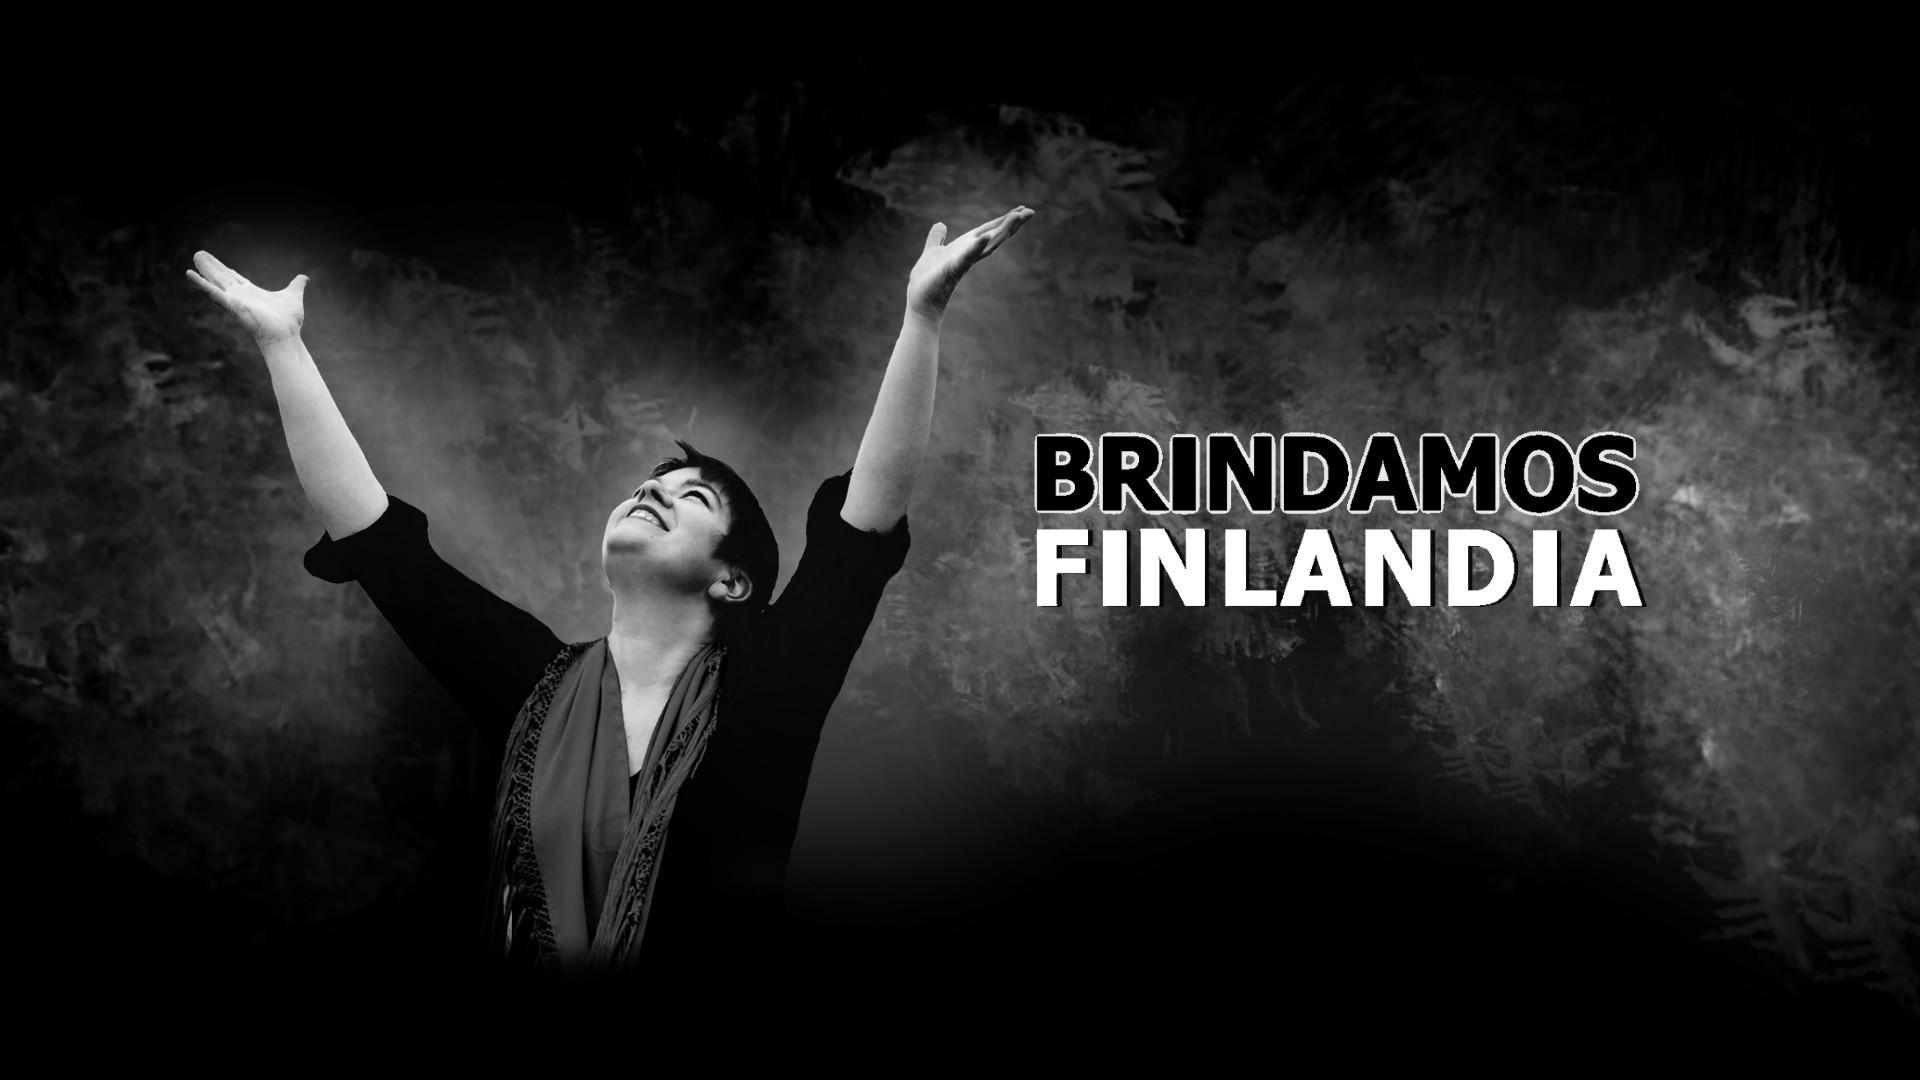 BRINDAMOS FINLANDIA EVENTS 2019 TOVE SEPT